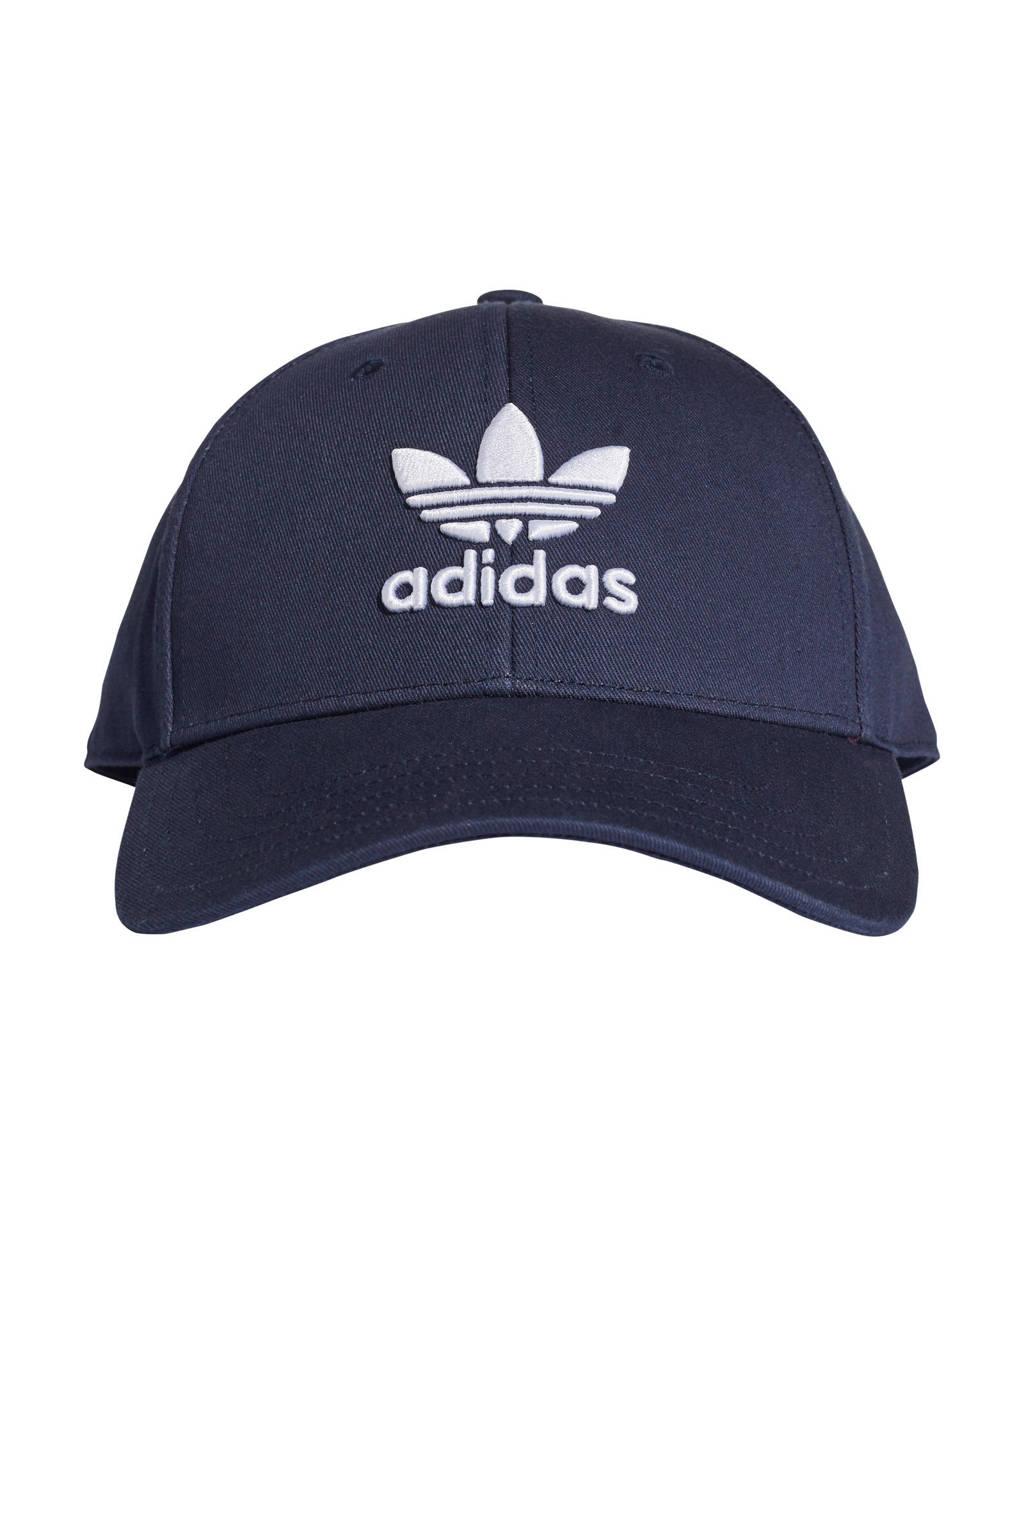 adidas Originals pet Baseball Classic Trefoil donkerblauw, Donkerblauw/wit